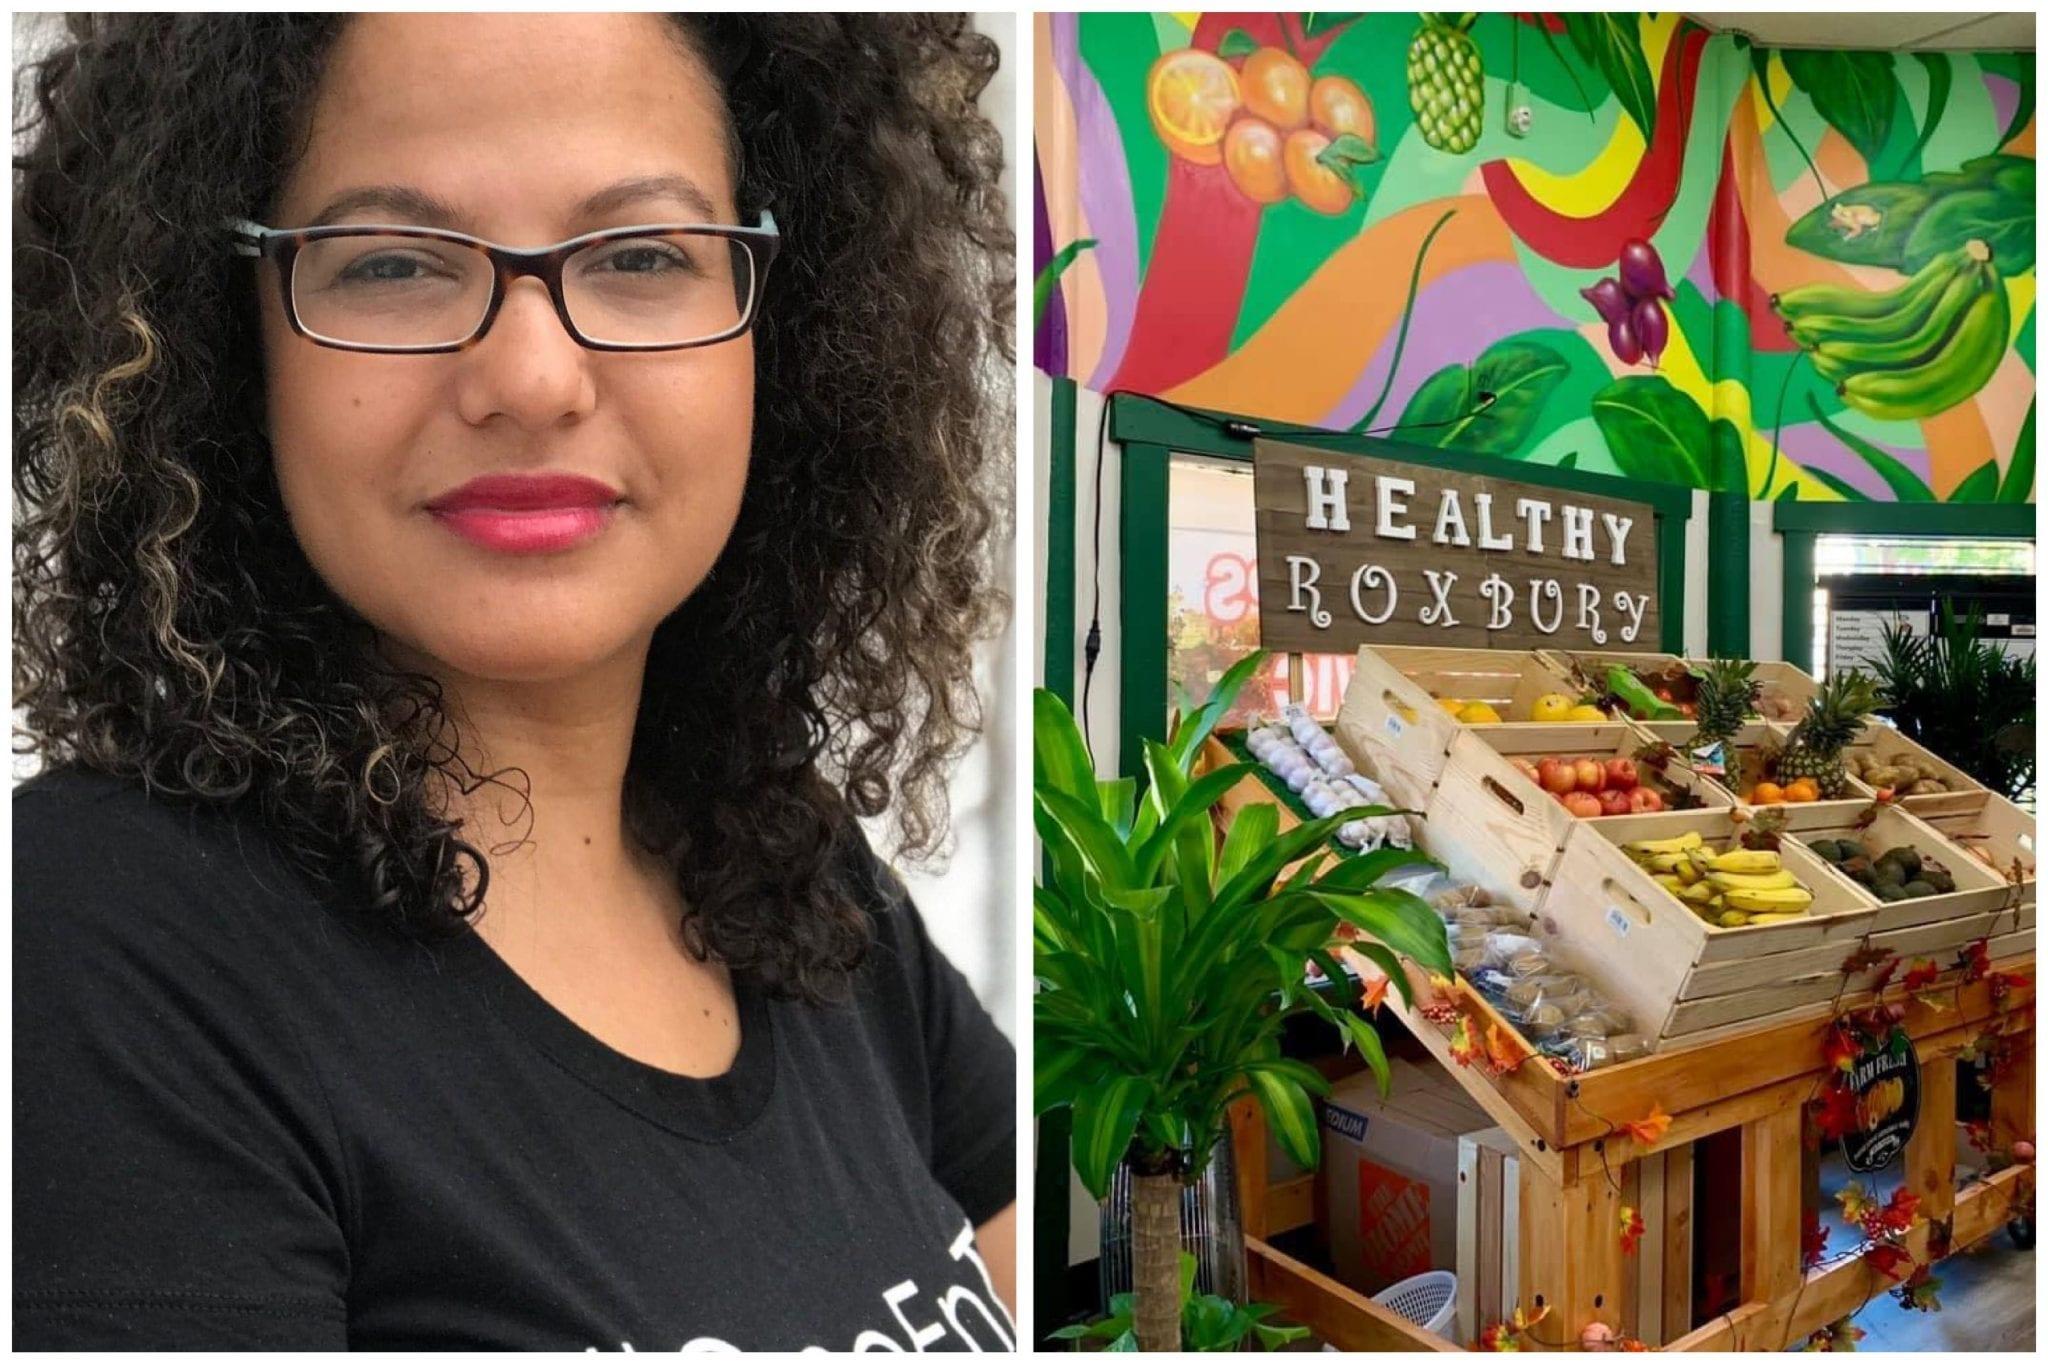 Evelyn Brito busca recuperar la tradicional bodega latina con innovador proyecto